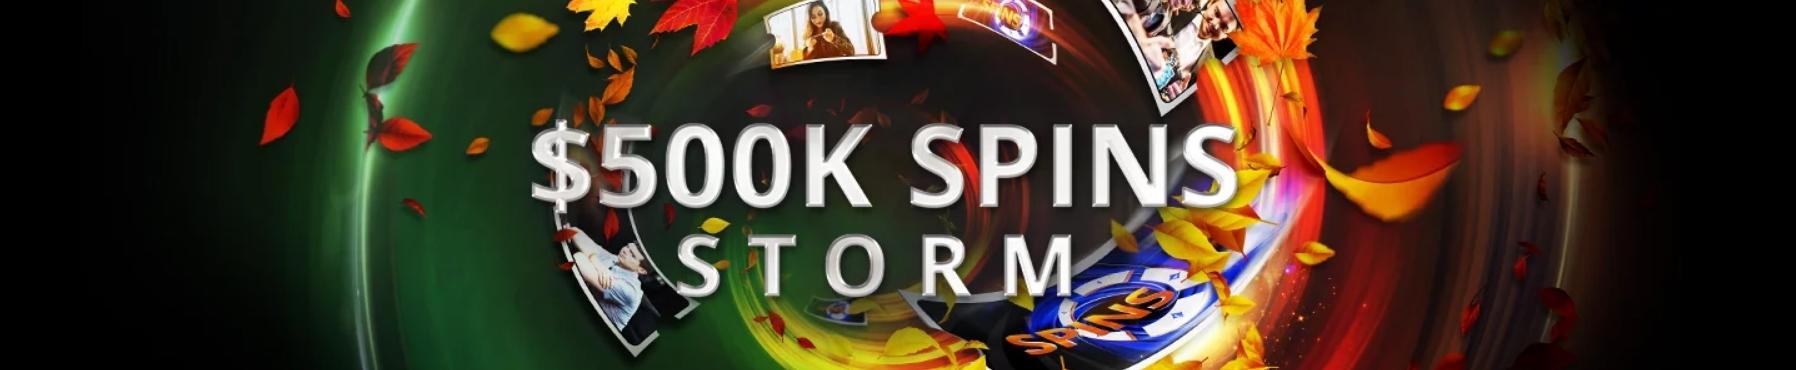 500k spins